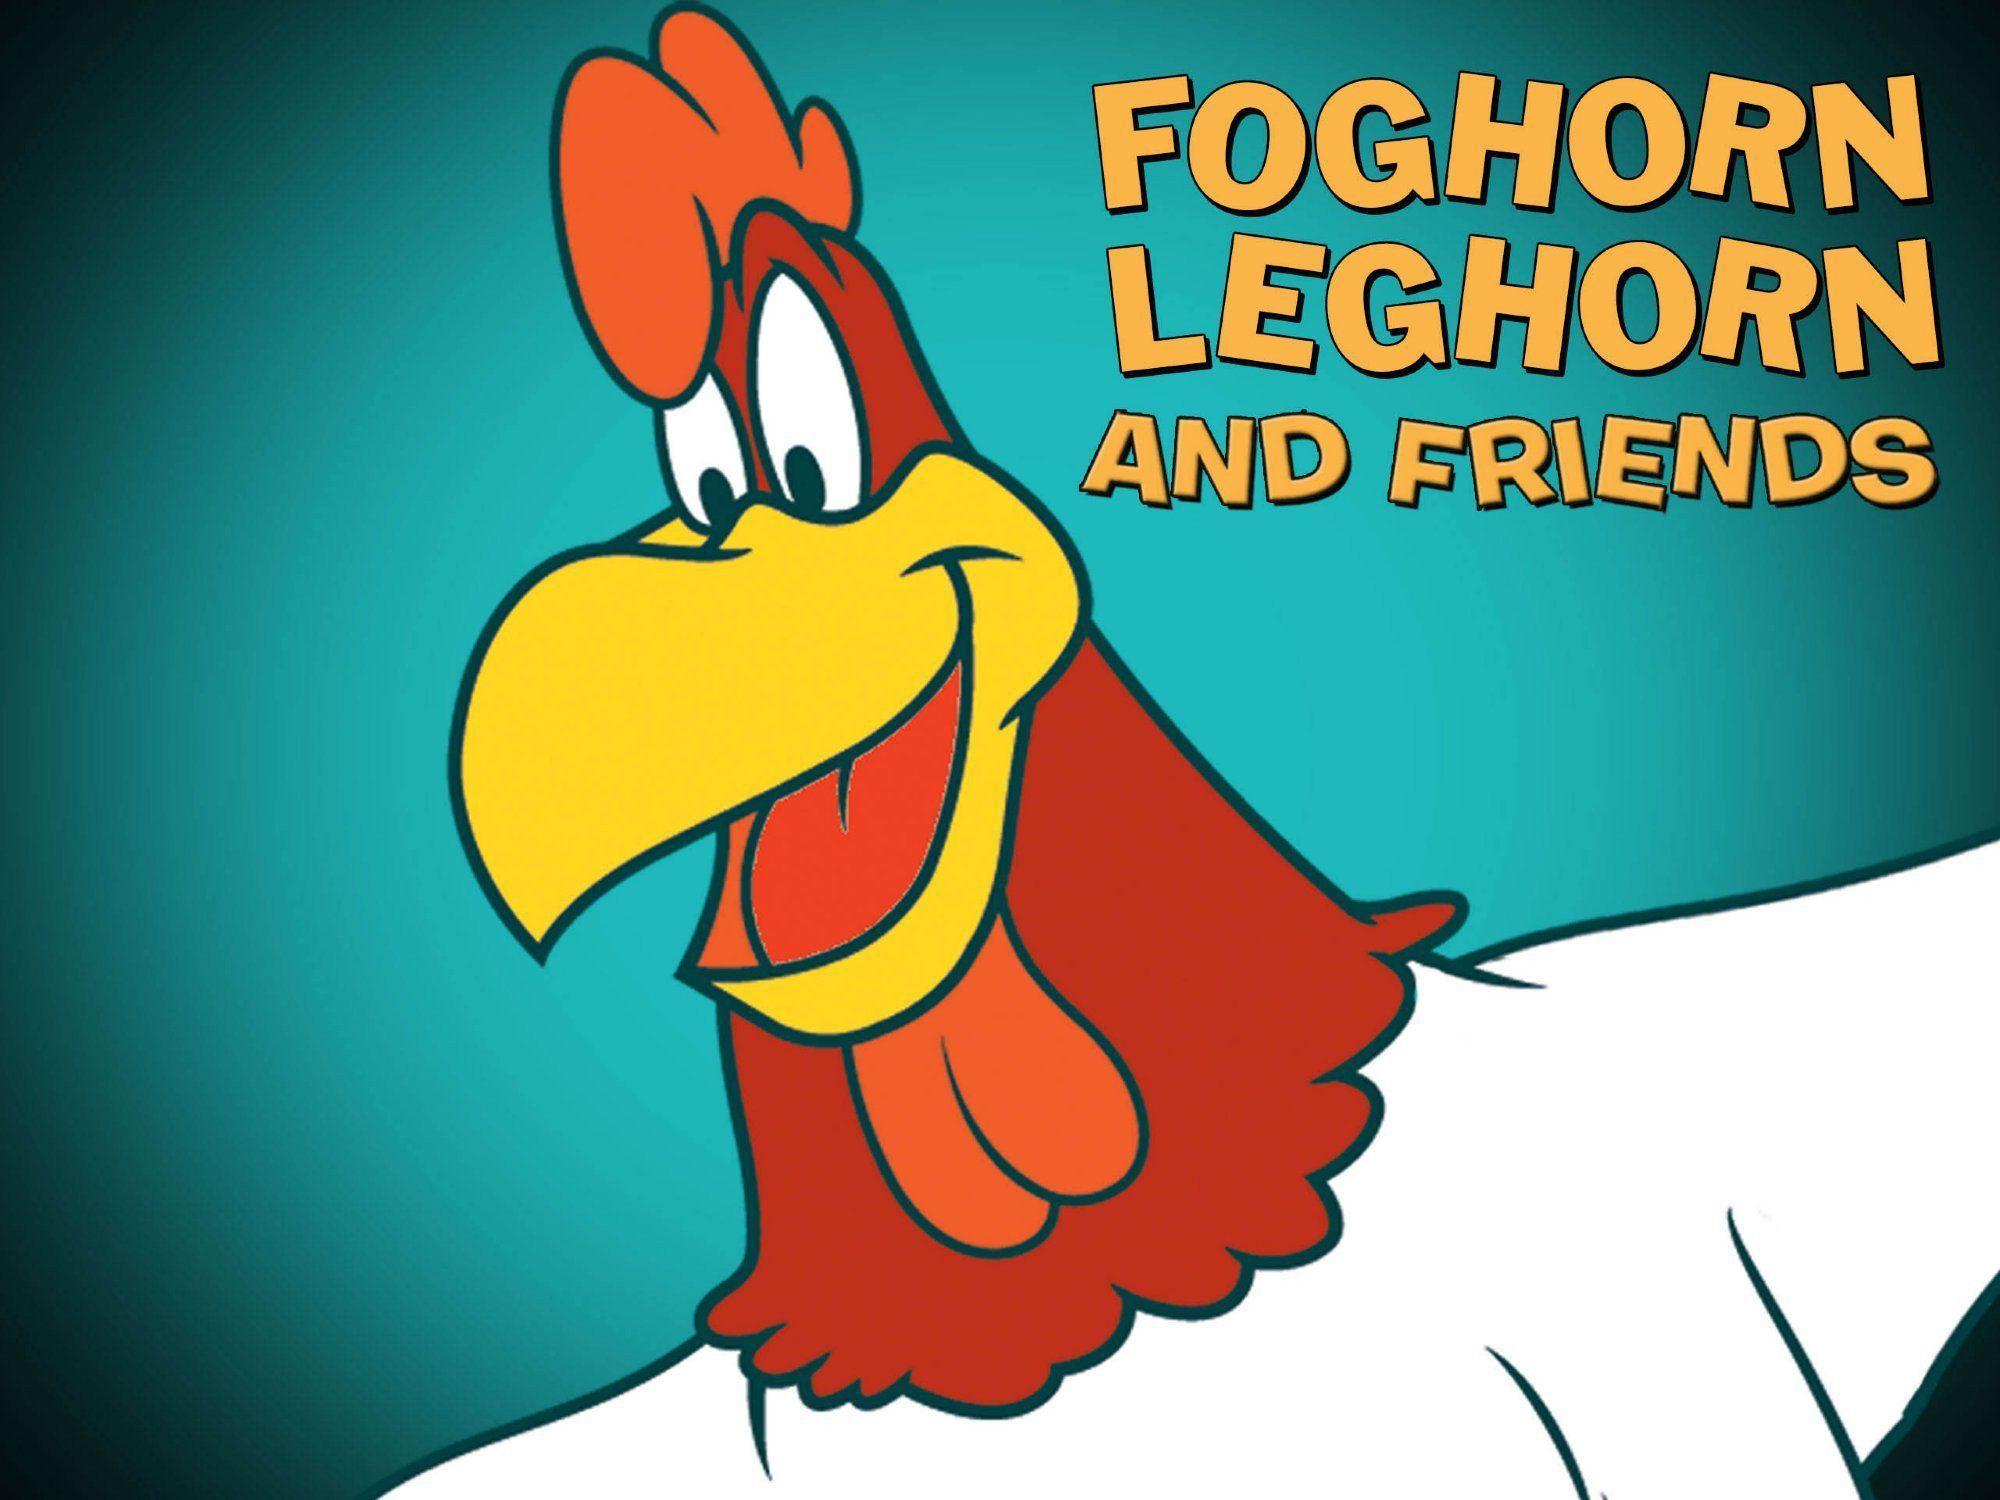 Foghorn Leghorn Wallpapers - Wallpaper Cave